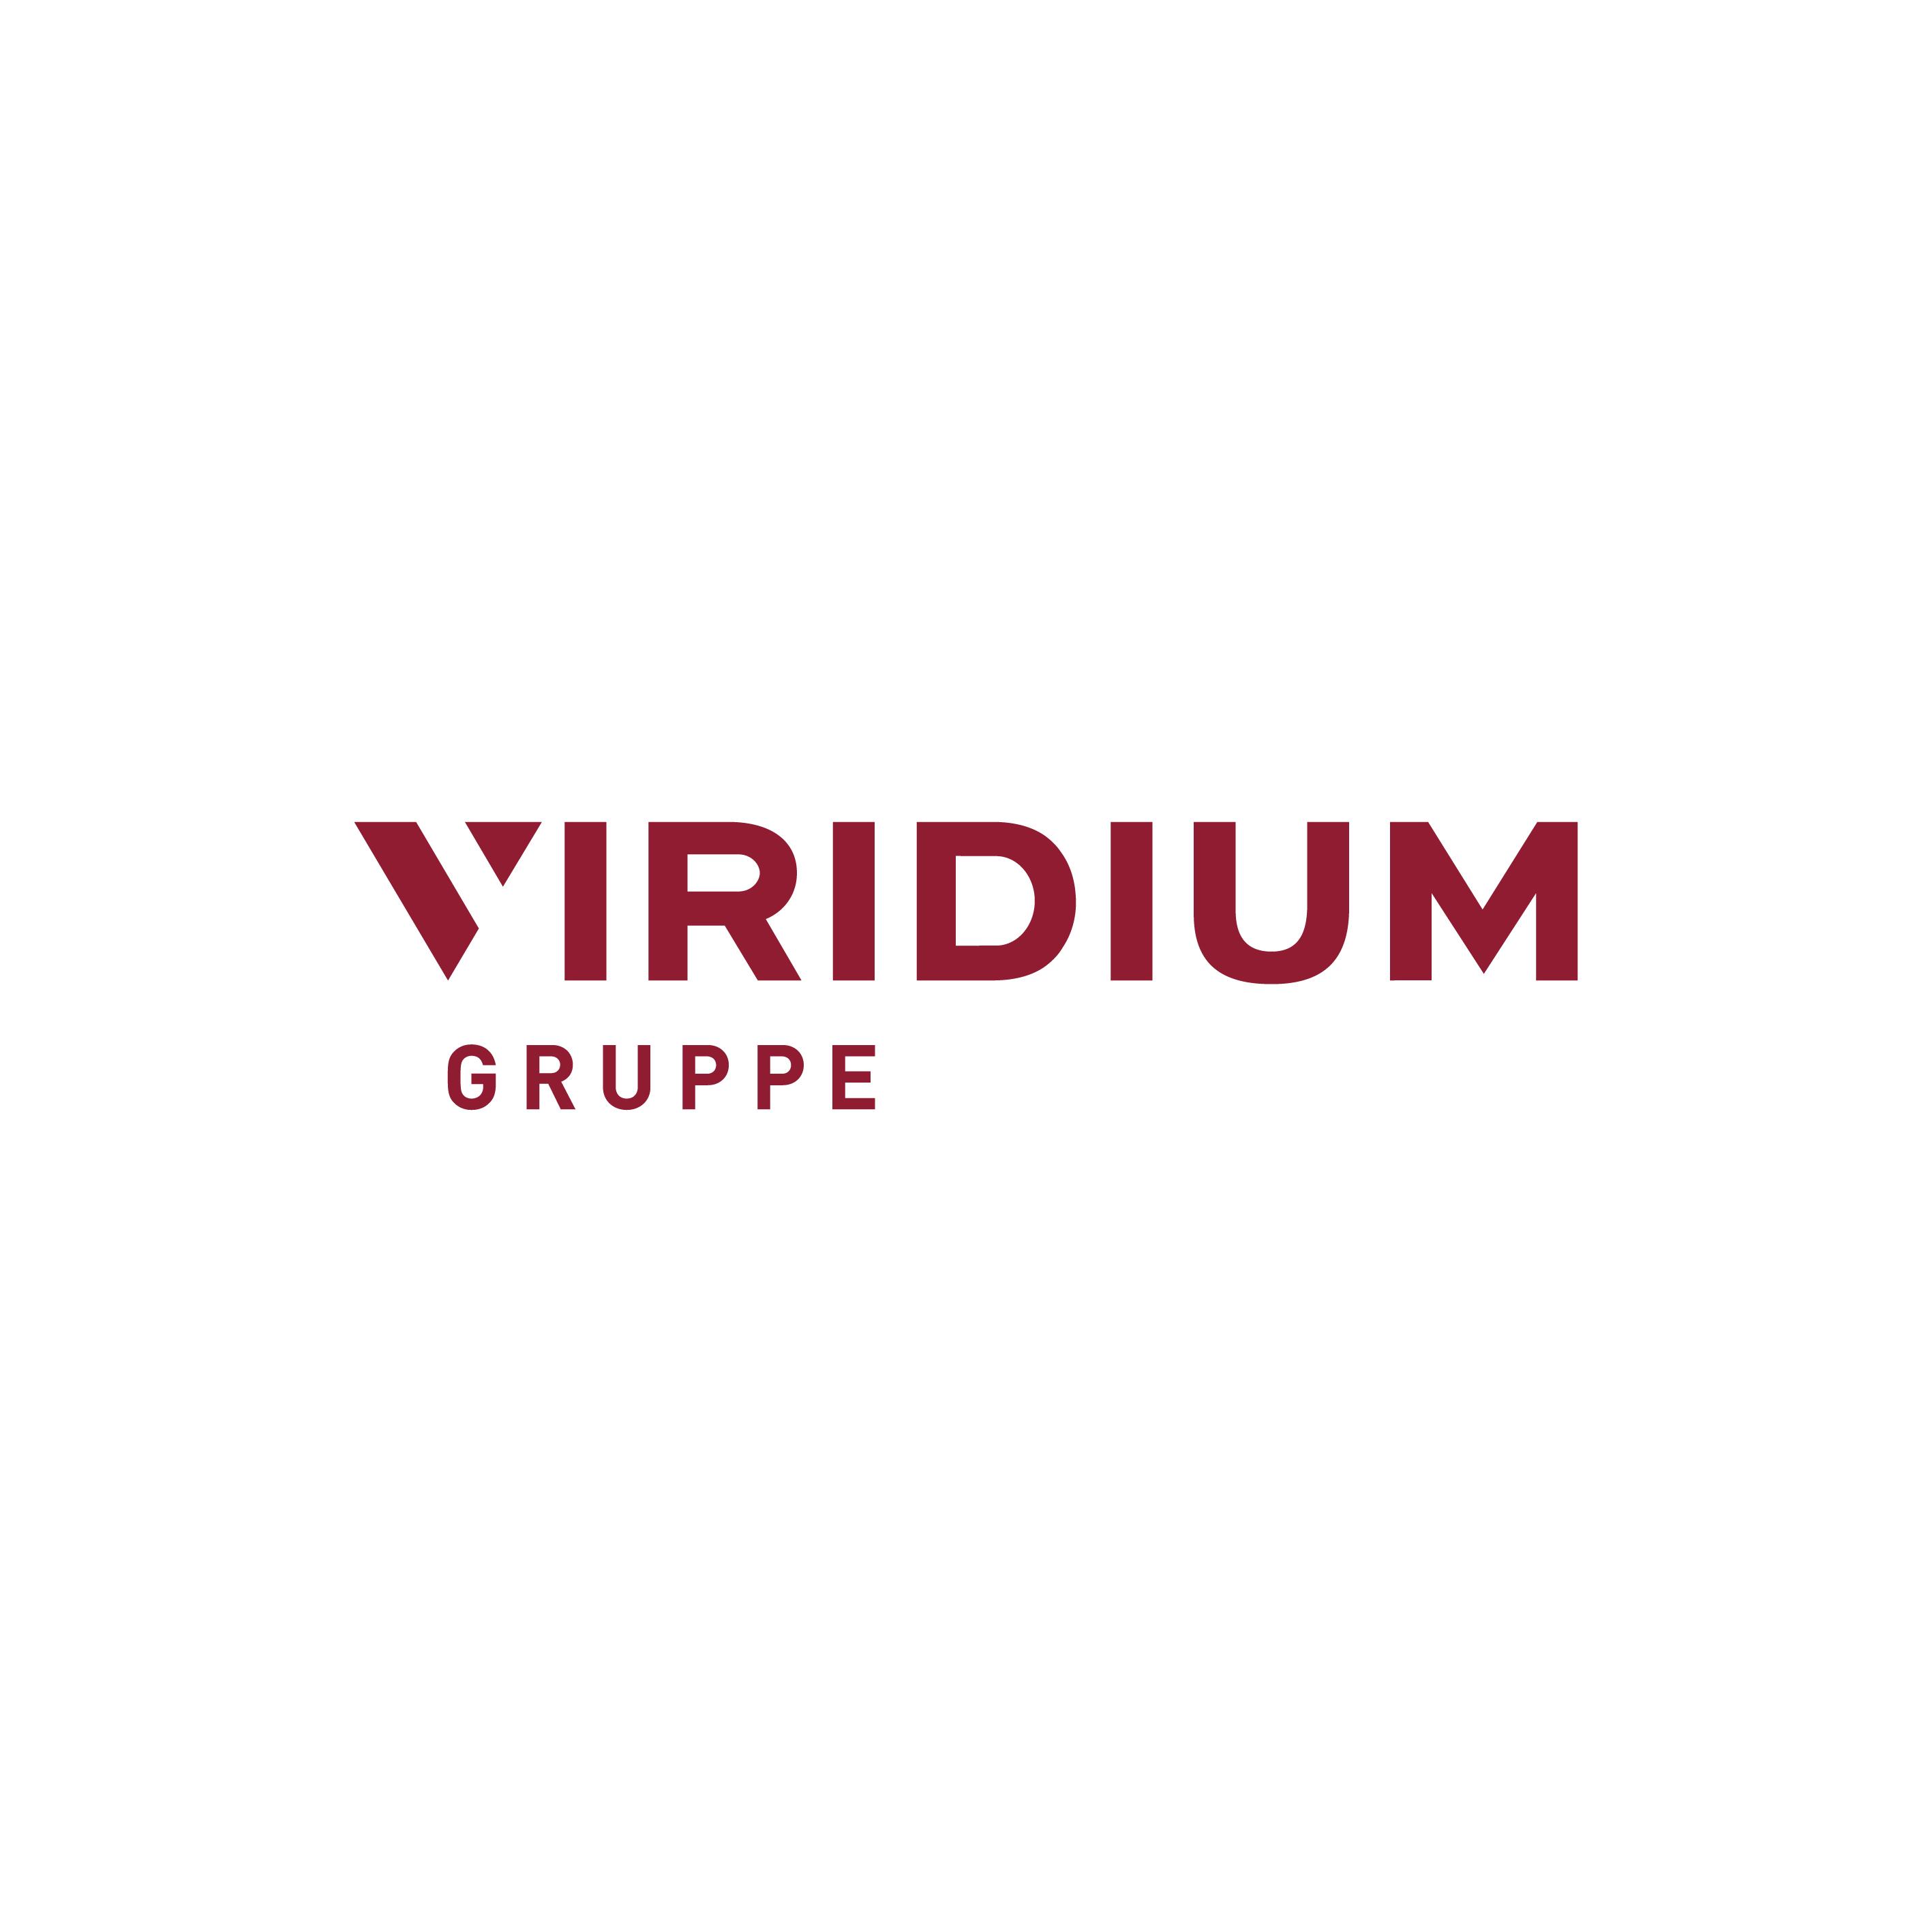 Viridium Gruppe